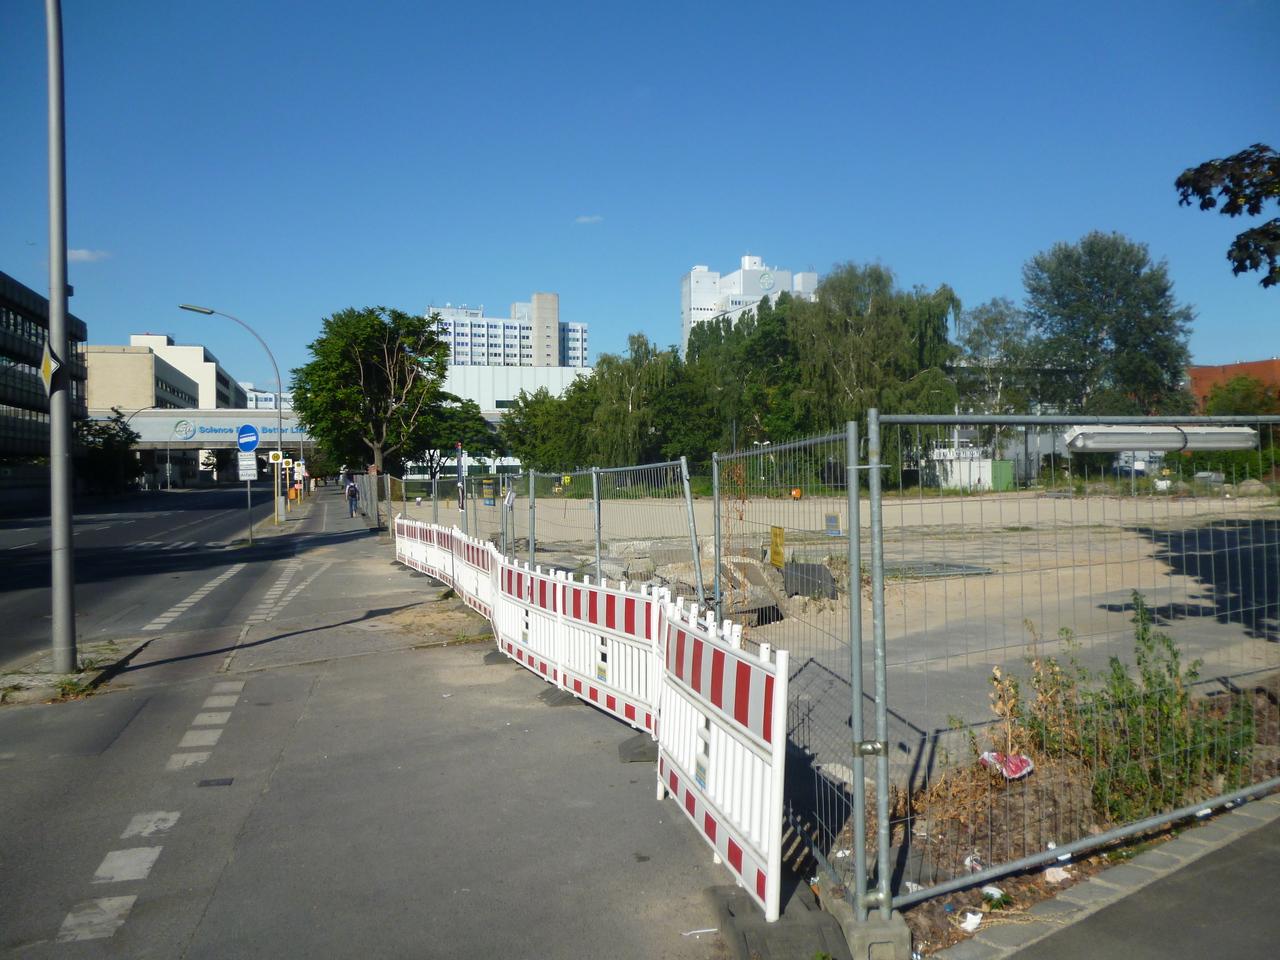 bayern-campusn4sr0.jpg